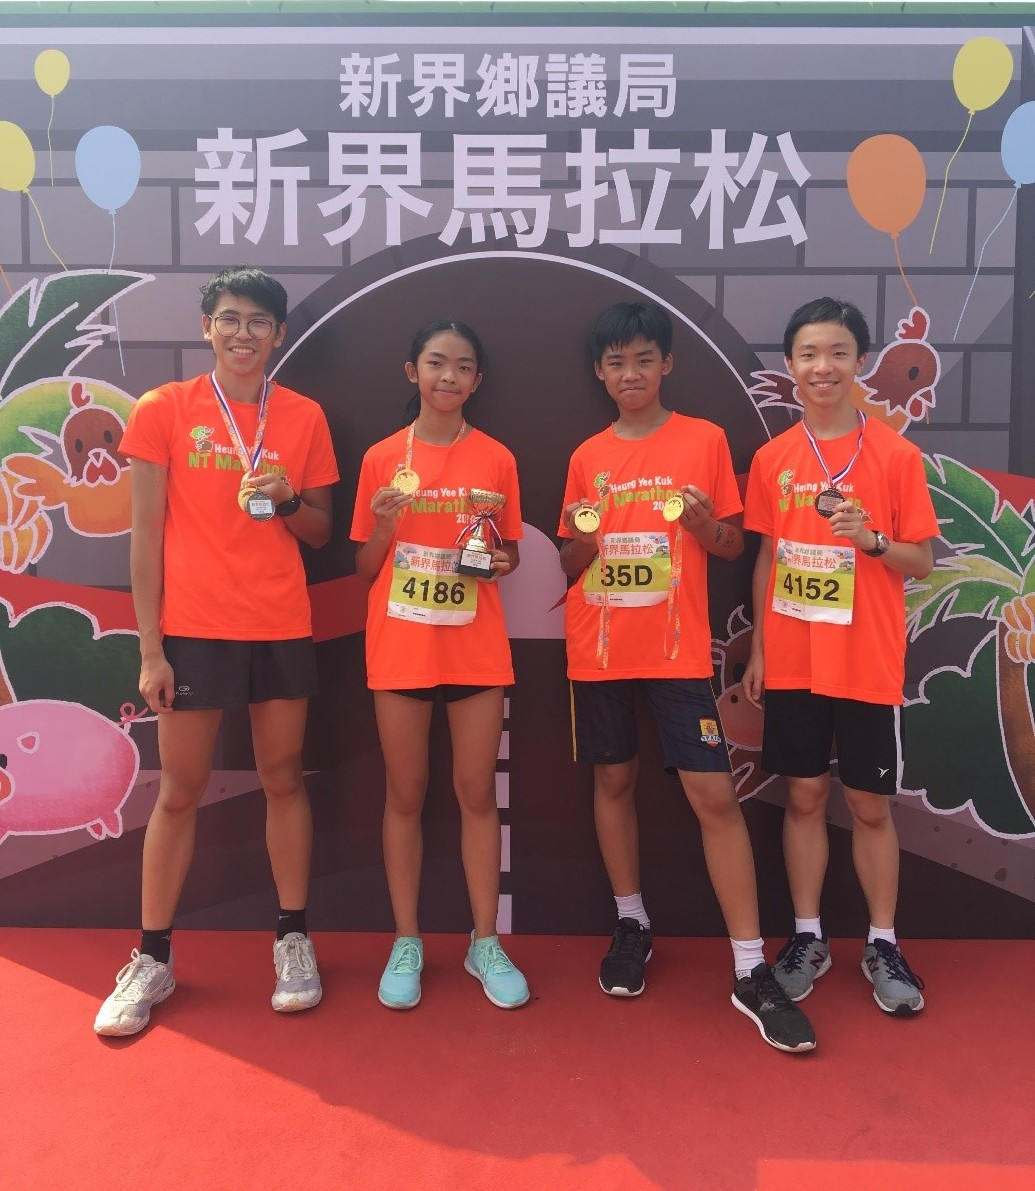 New Territories Marathon 2019